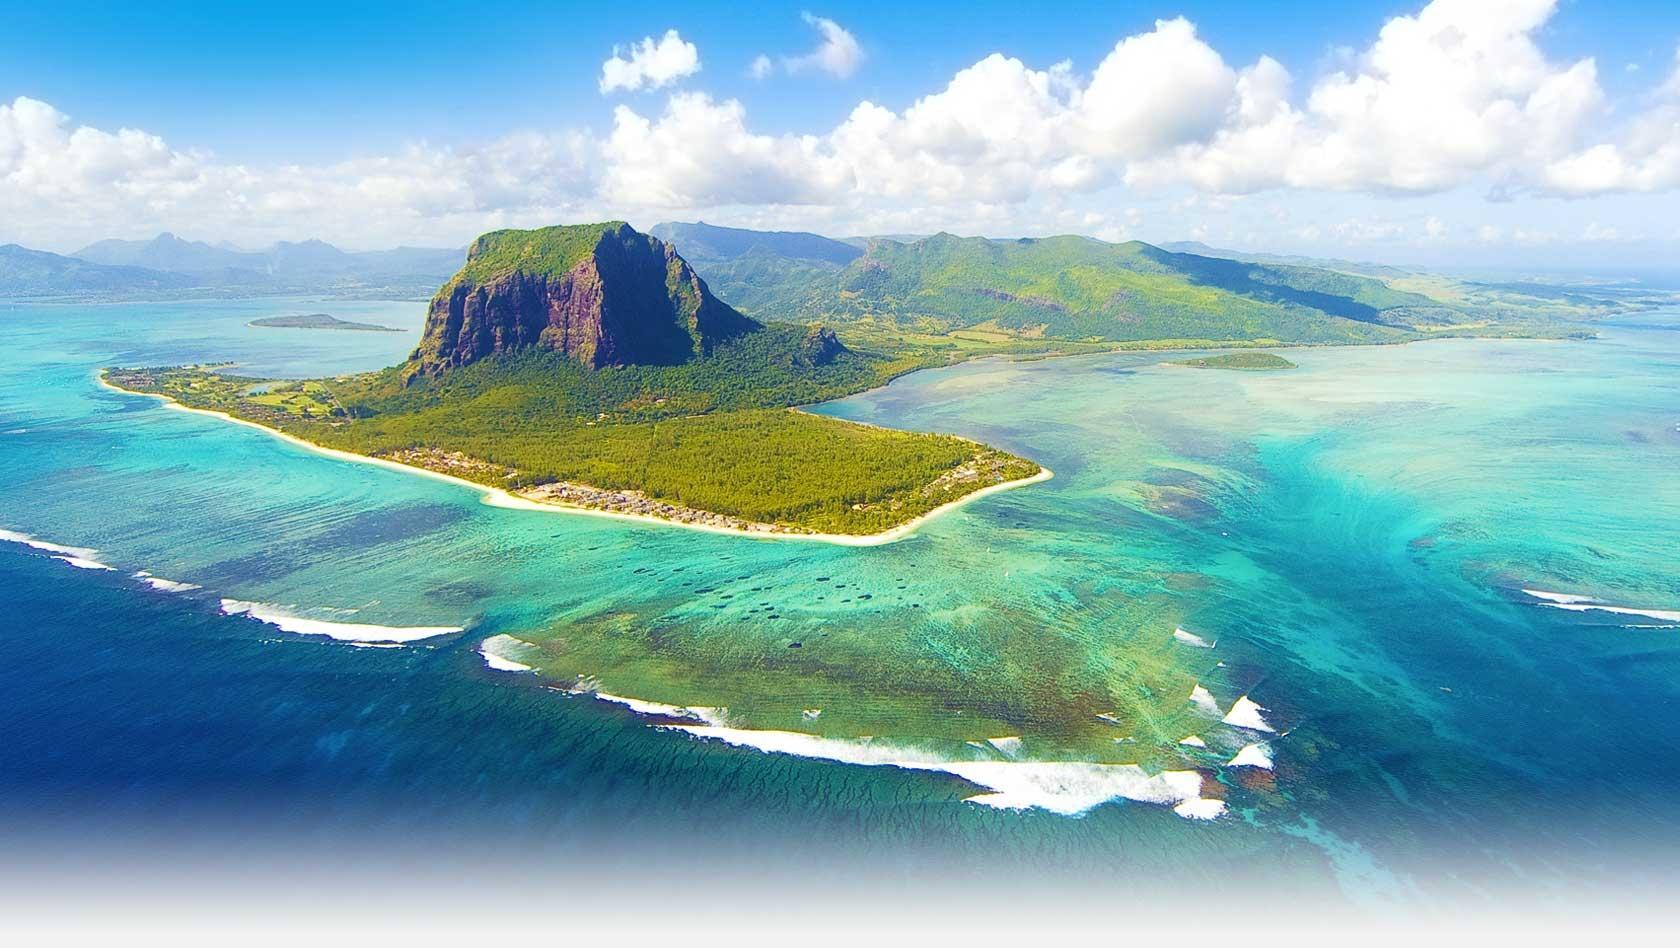 mauritius - photo #32